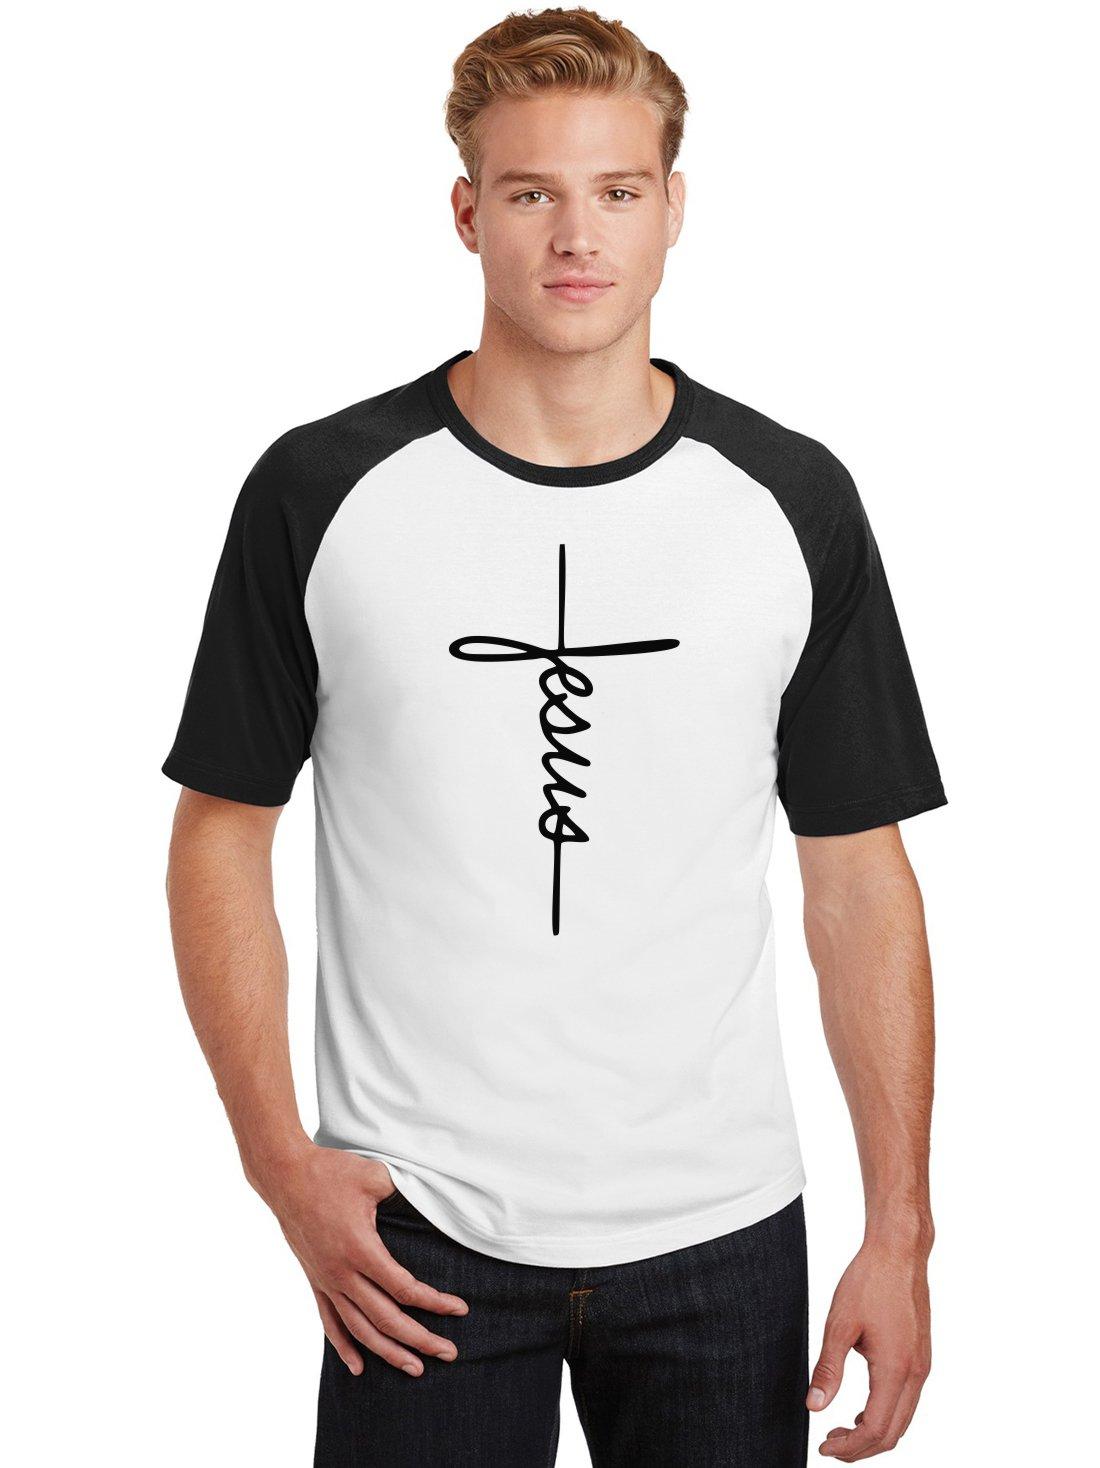 Camiseta Raglan Masculina Jesus Cristã Religiosa ES_169